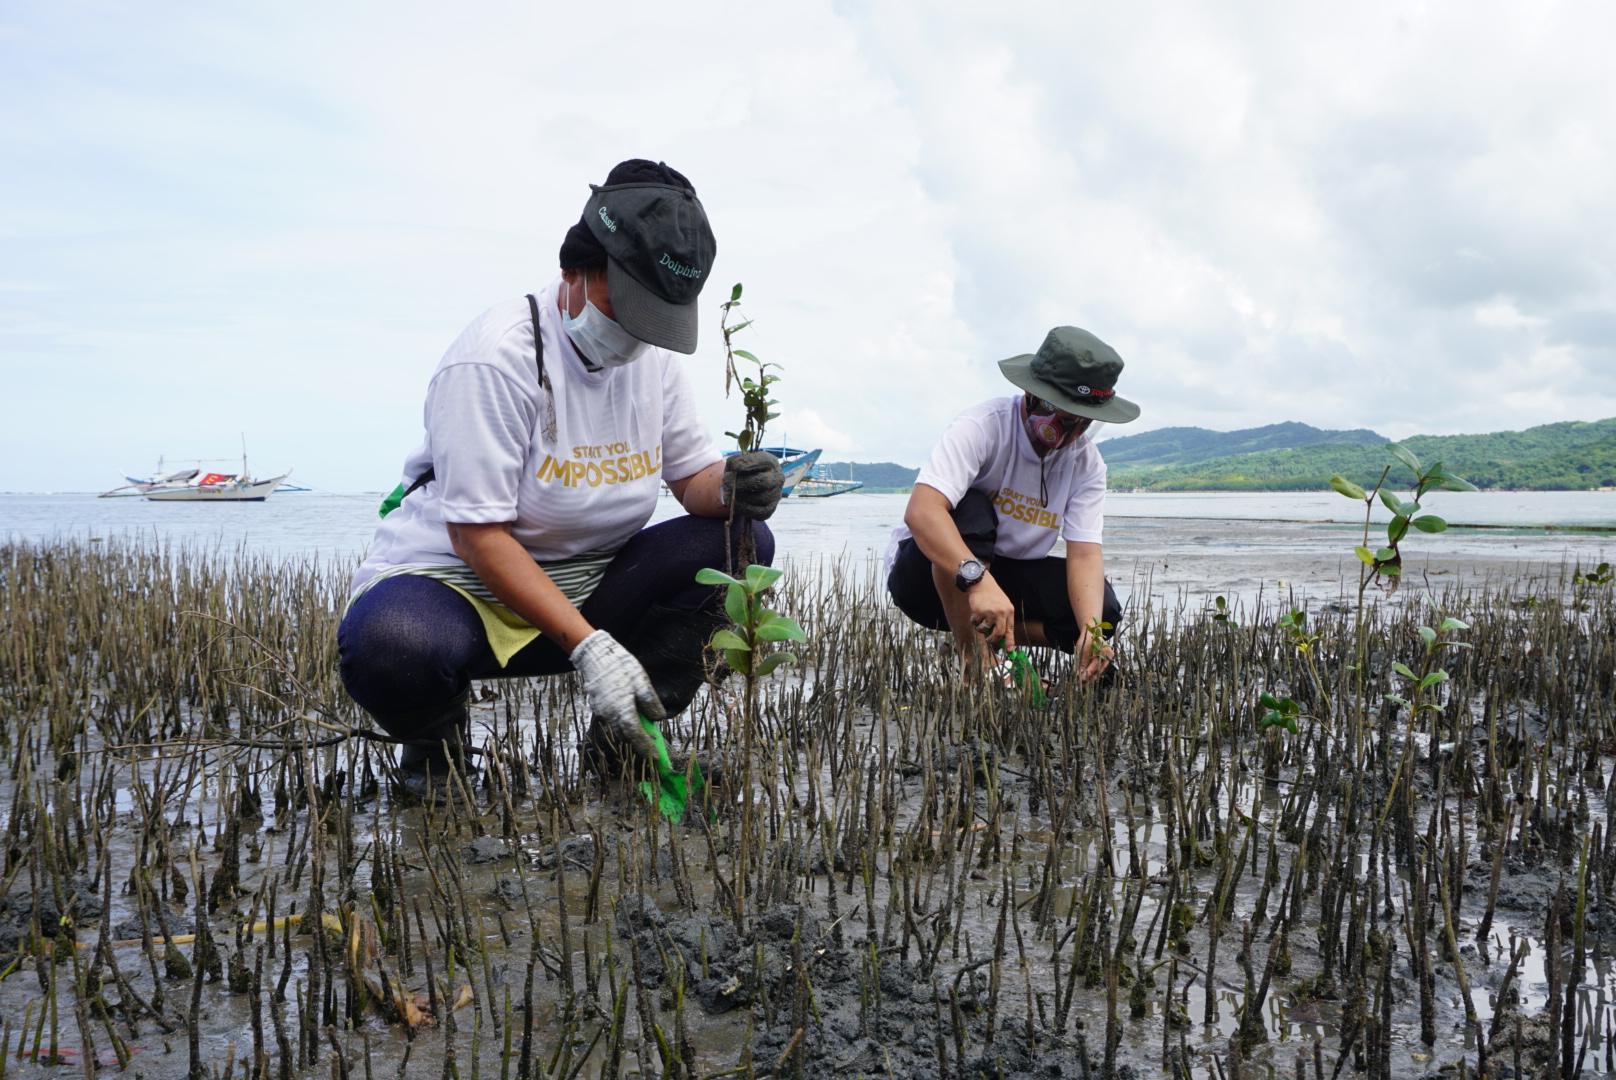 Toyota adopts 10-HA mangrove plantation area in Lian, Batangas.